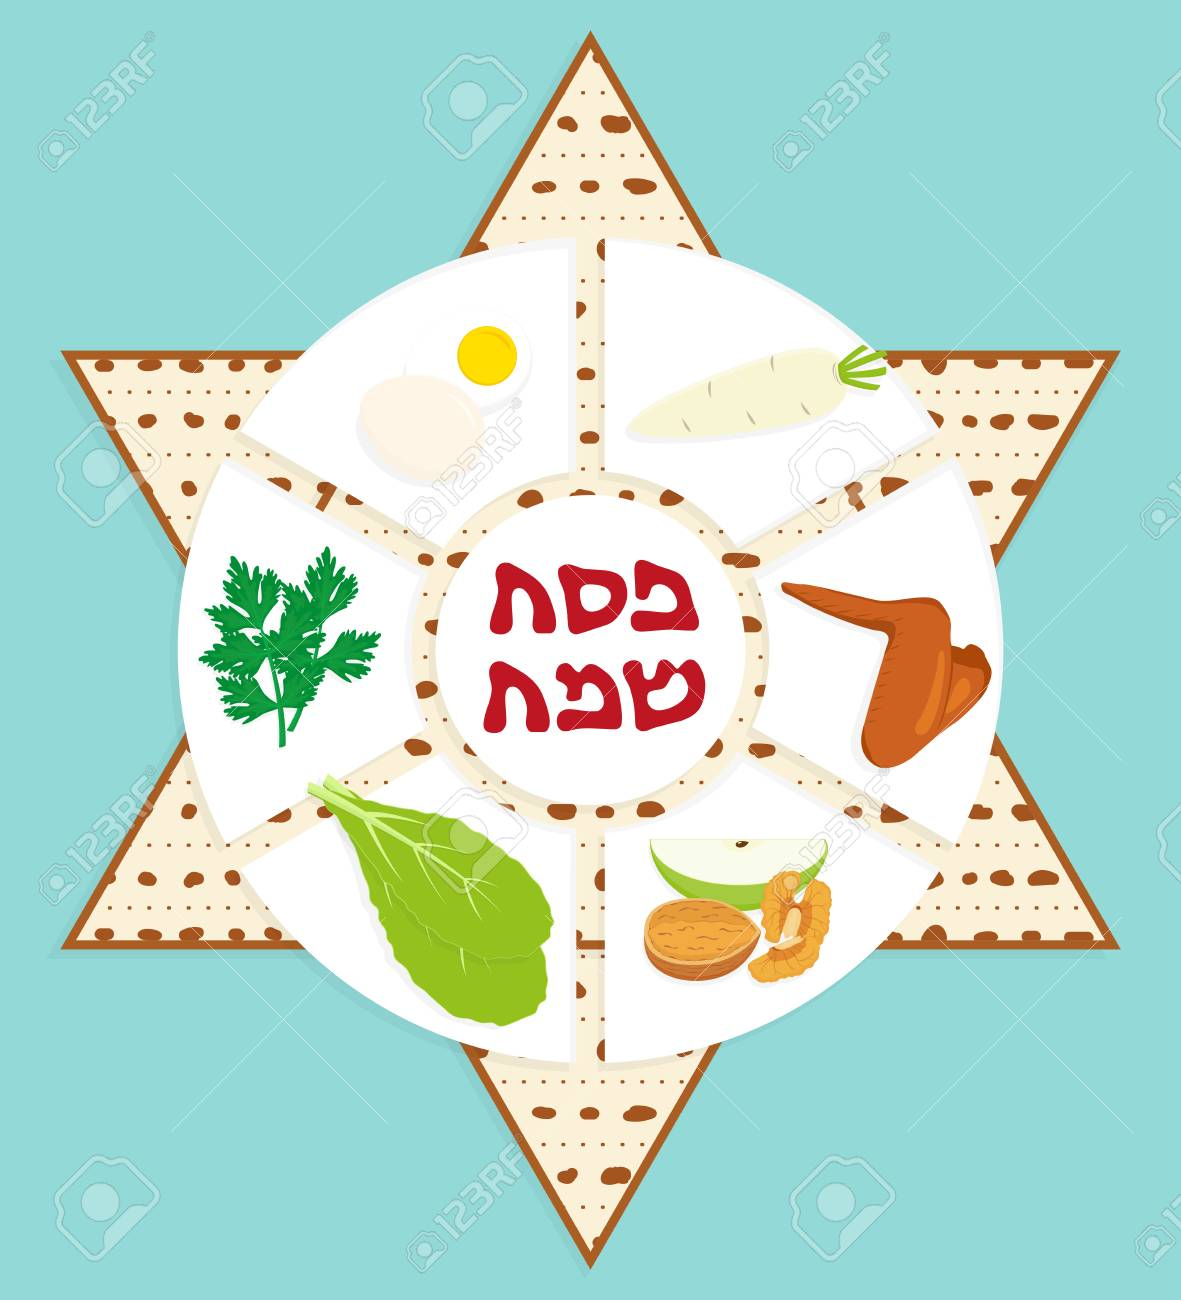 Passover Seder Plate Holiday Symbolic Foods On Matzah Star